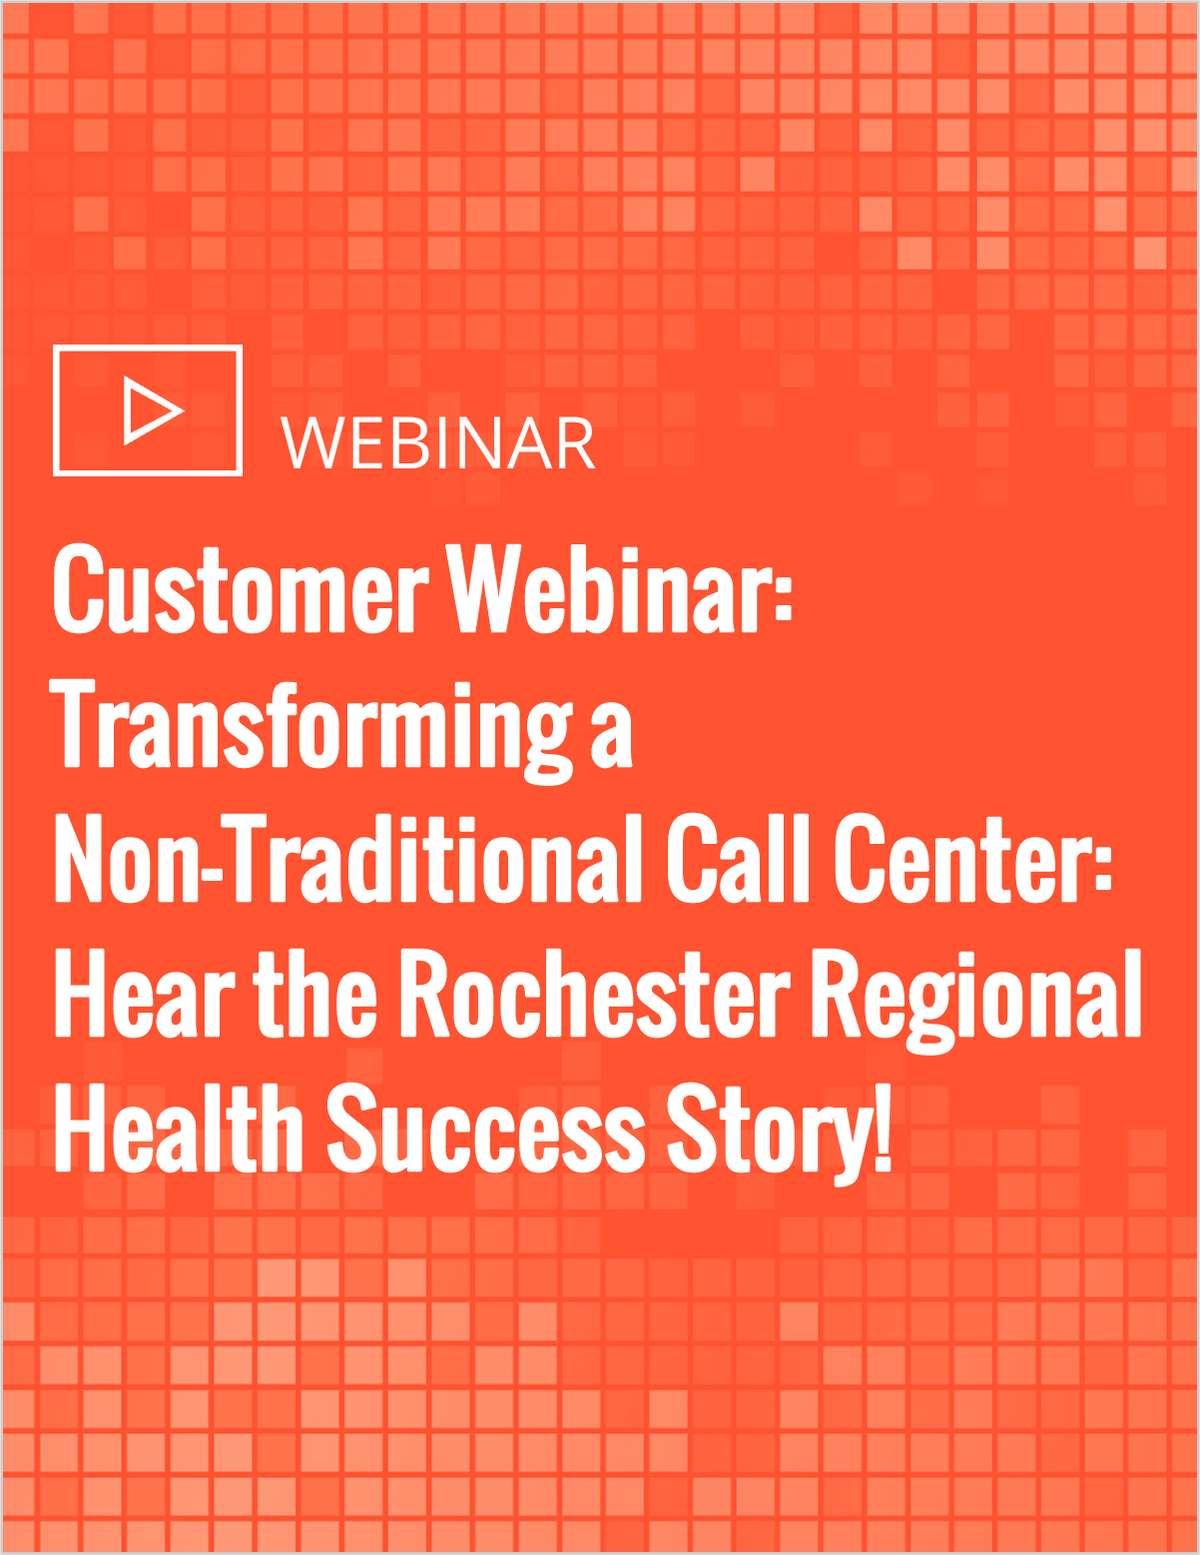 Customer Webinar: Transforming a Non-Traditional Call Center: Hear the Rochester Regional Health Success Story!